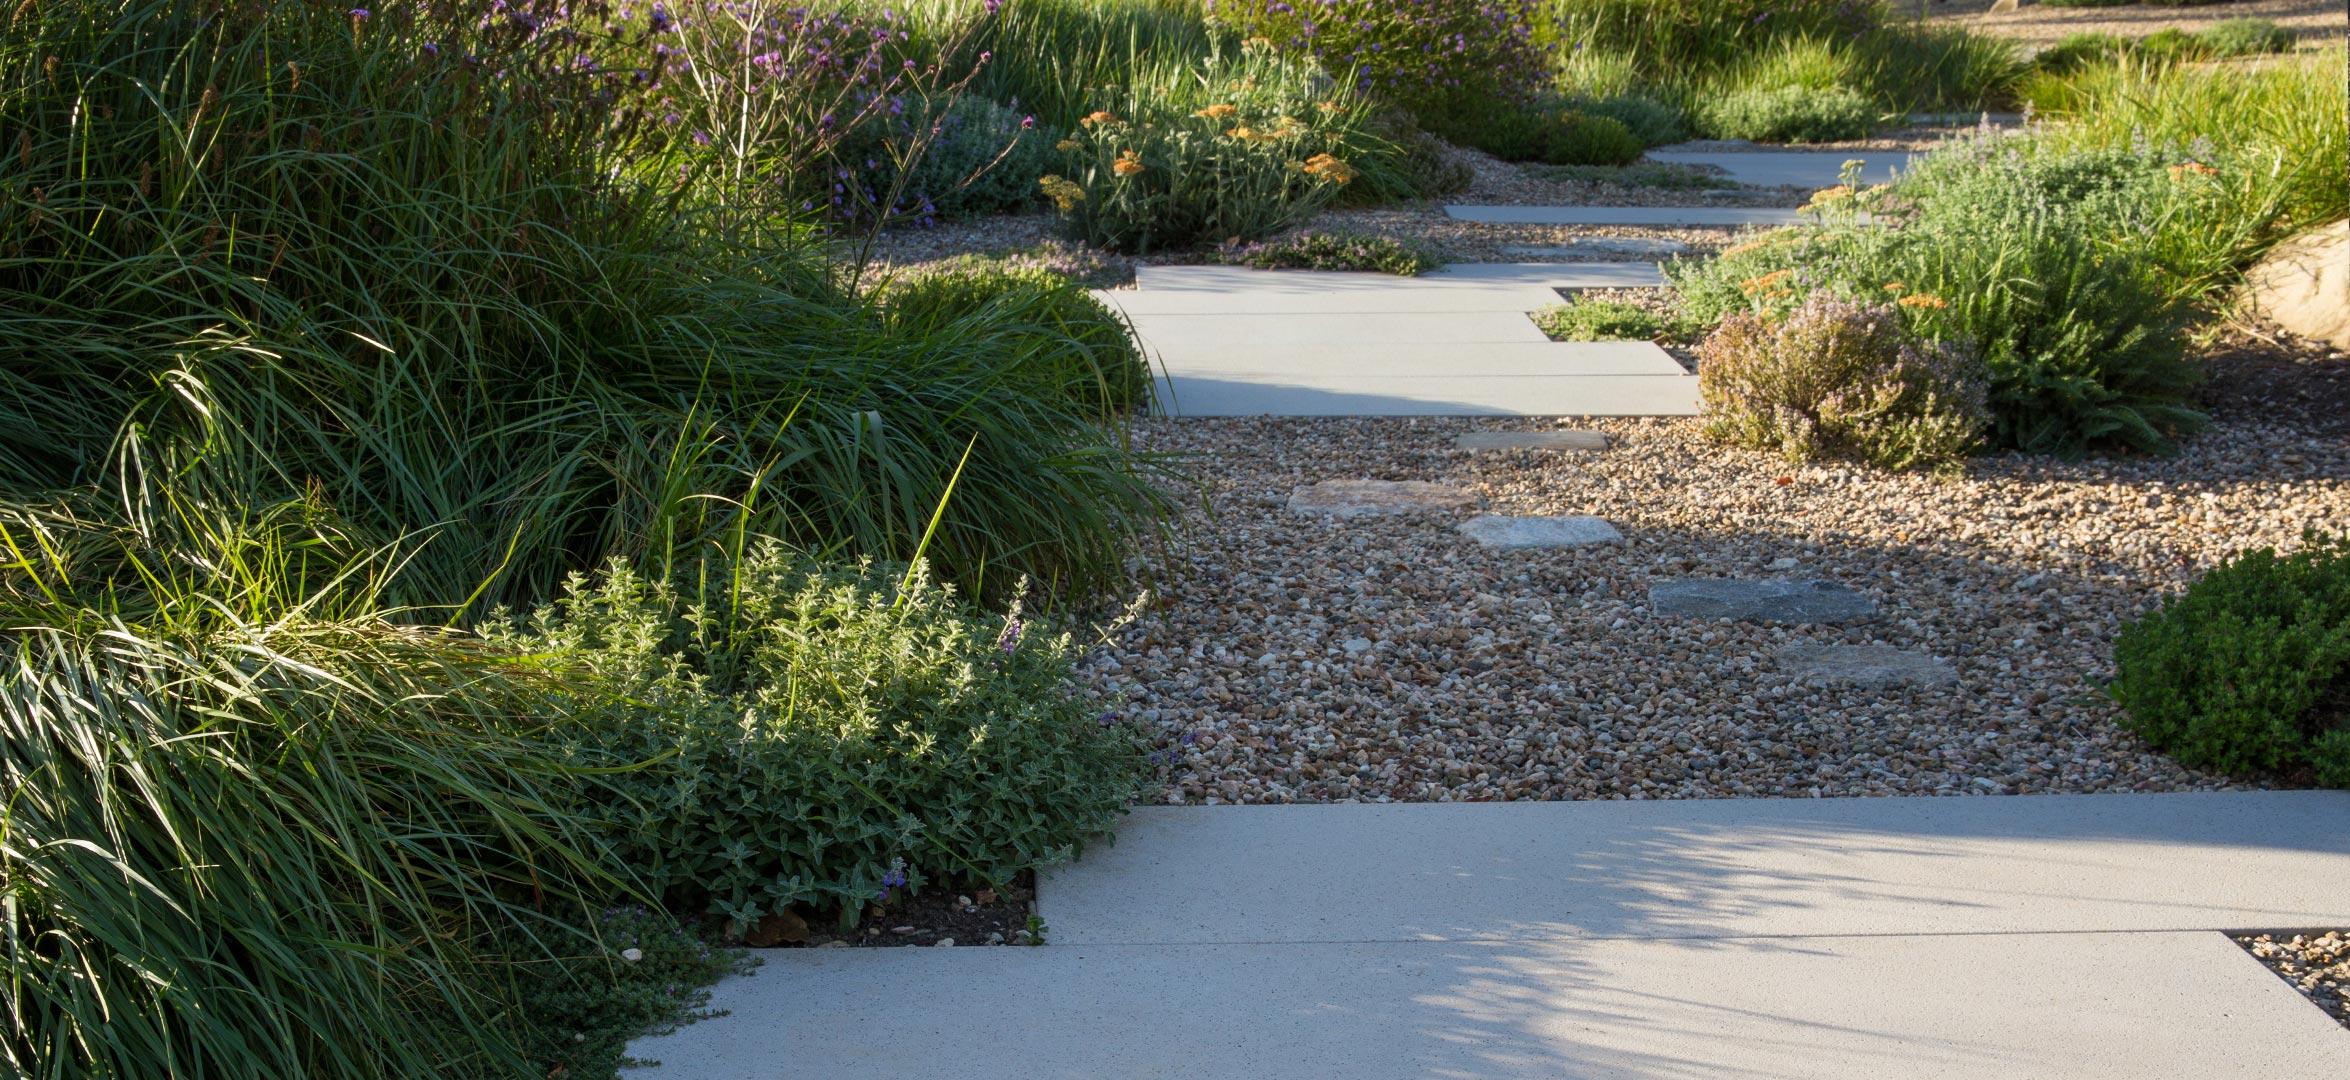 09-pavers-path.jpg